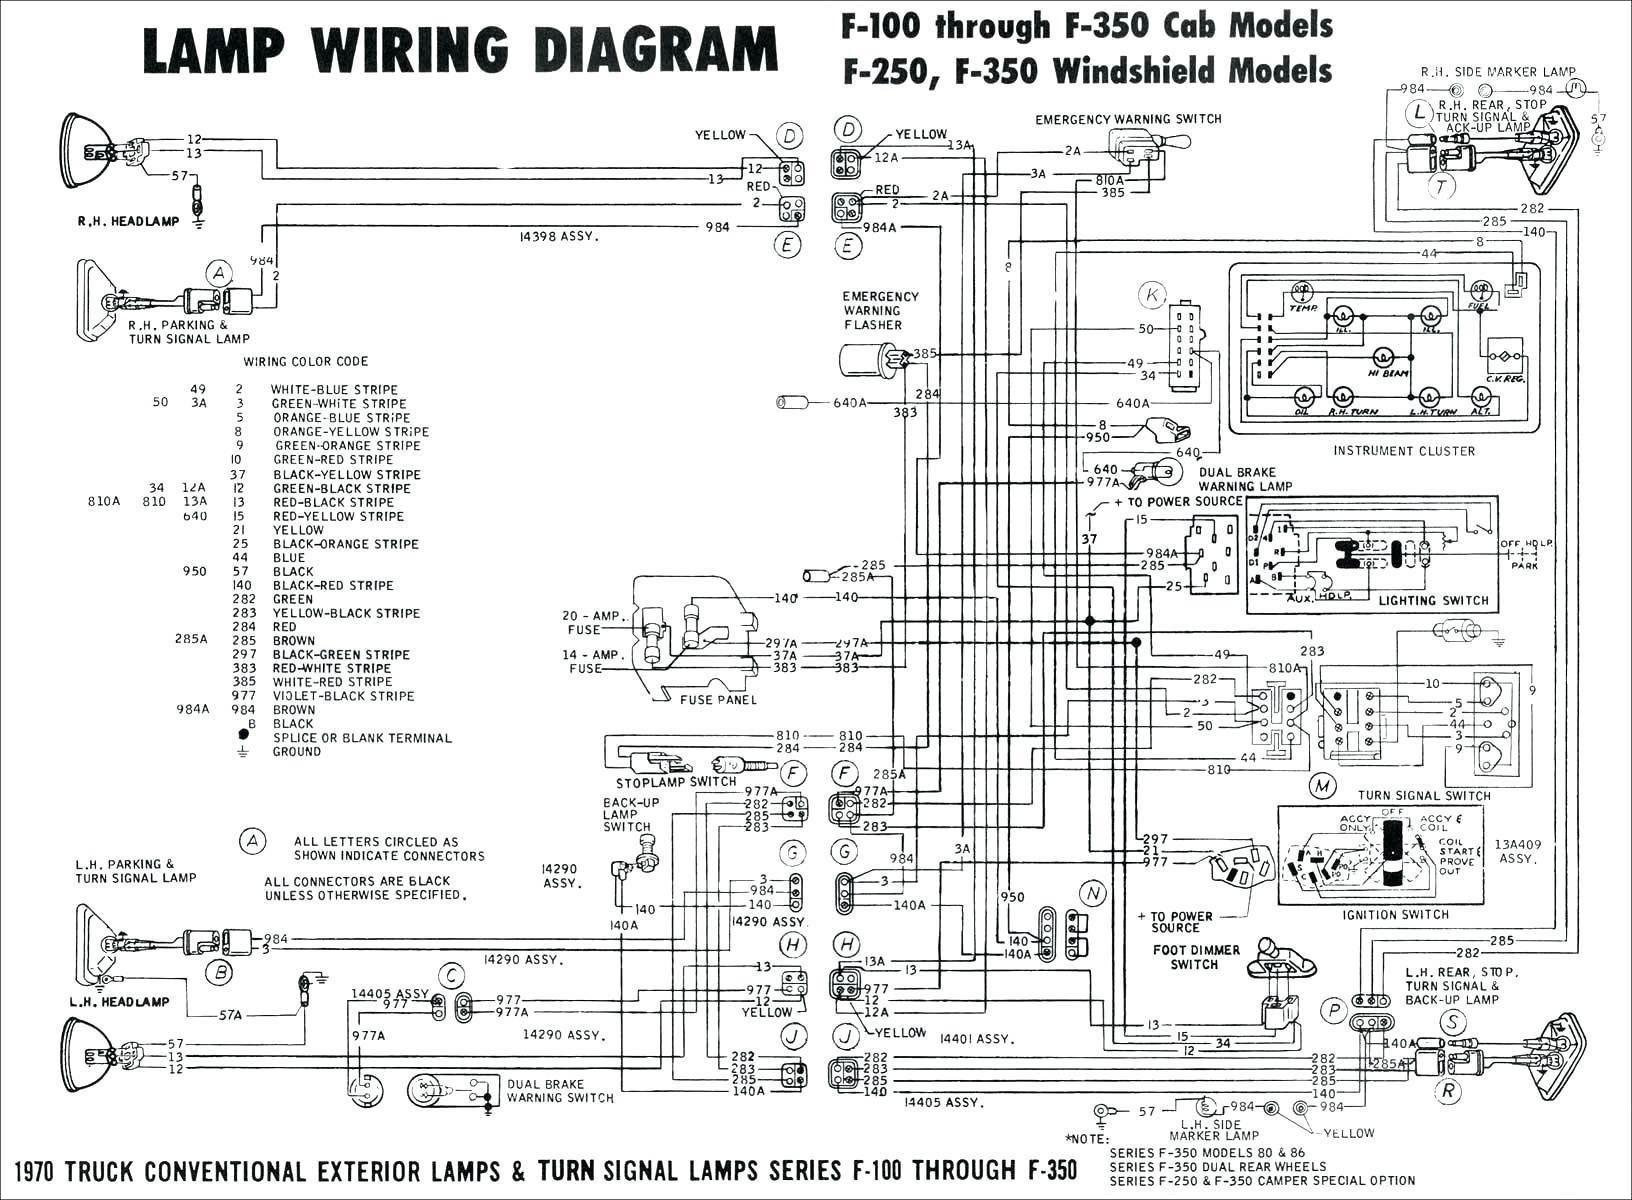 Bendix Ec 30 Wiring Diagram - All Wiring Diagram - Wabco Abs Wiring Diagram